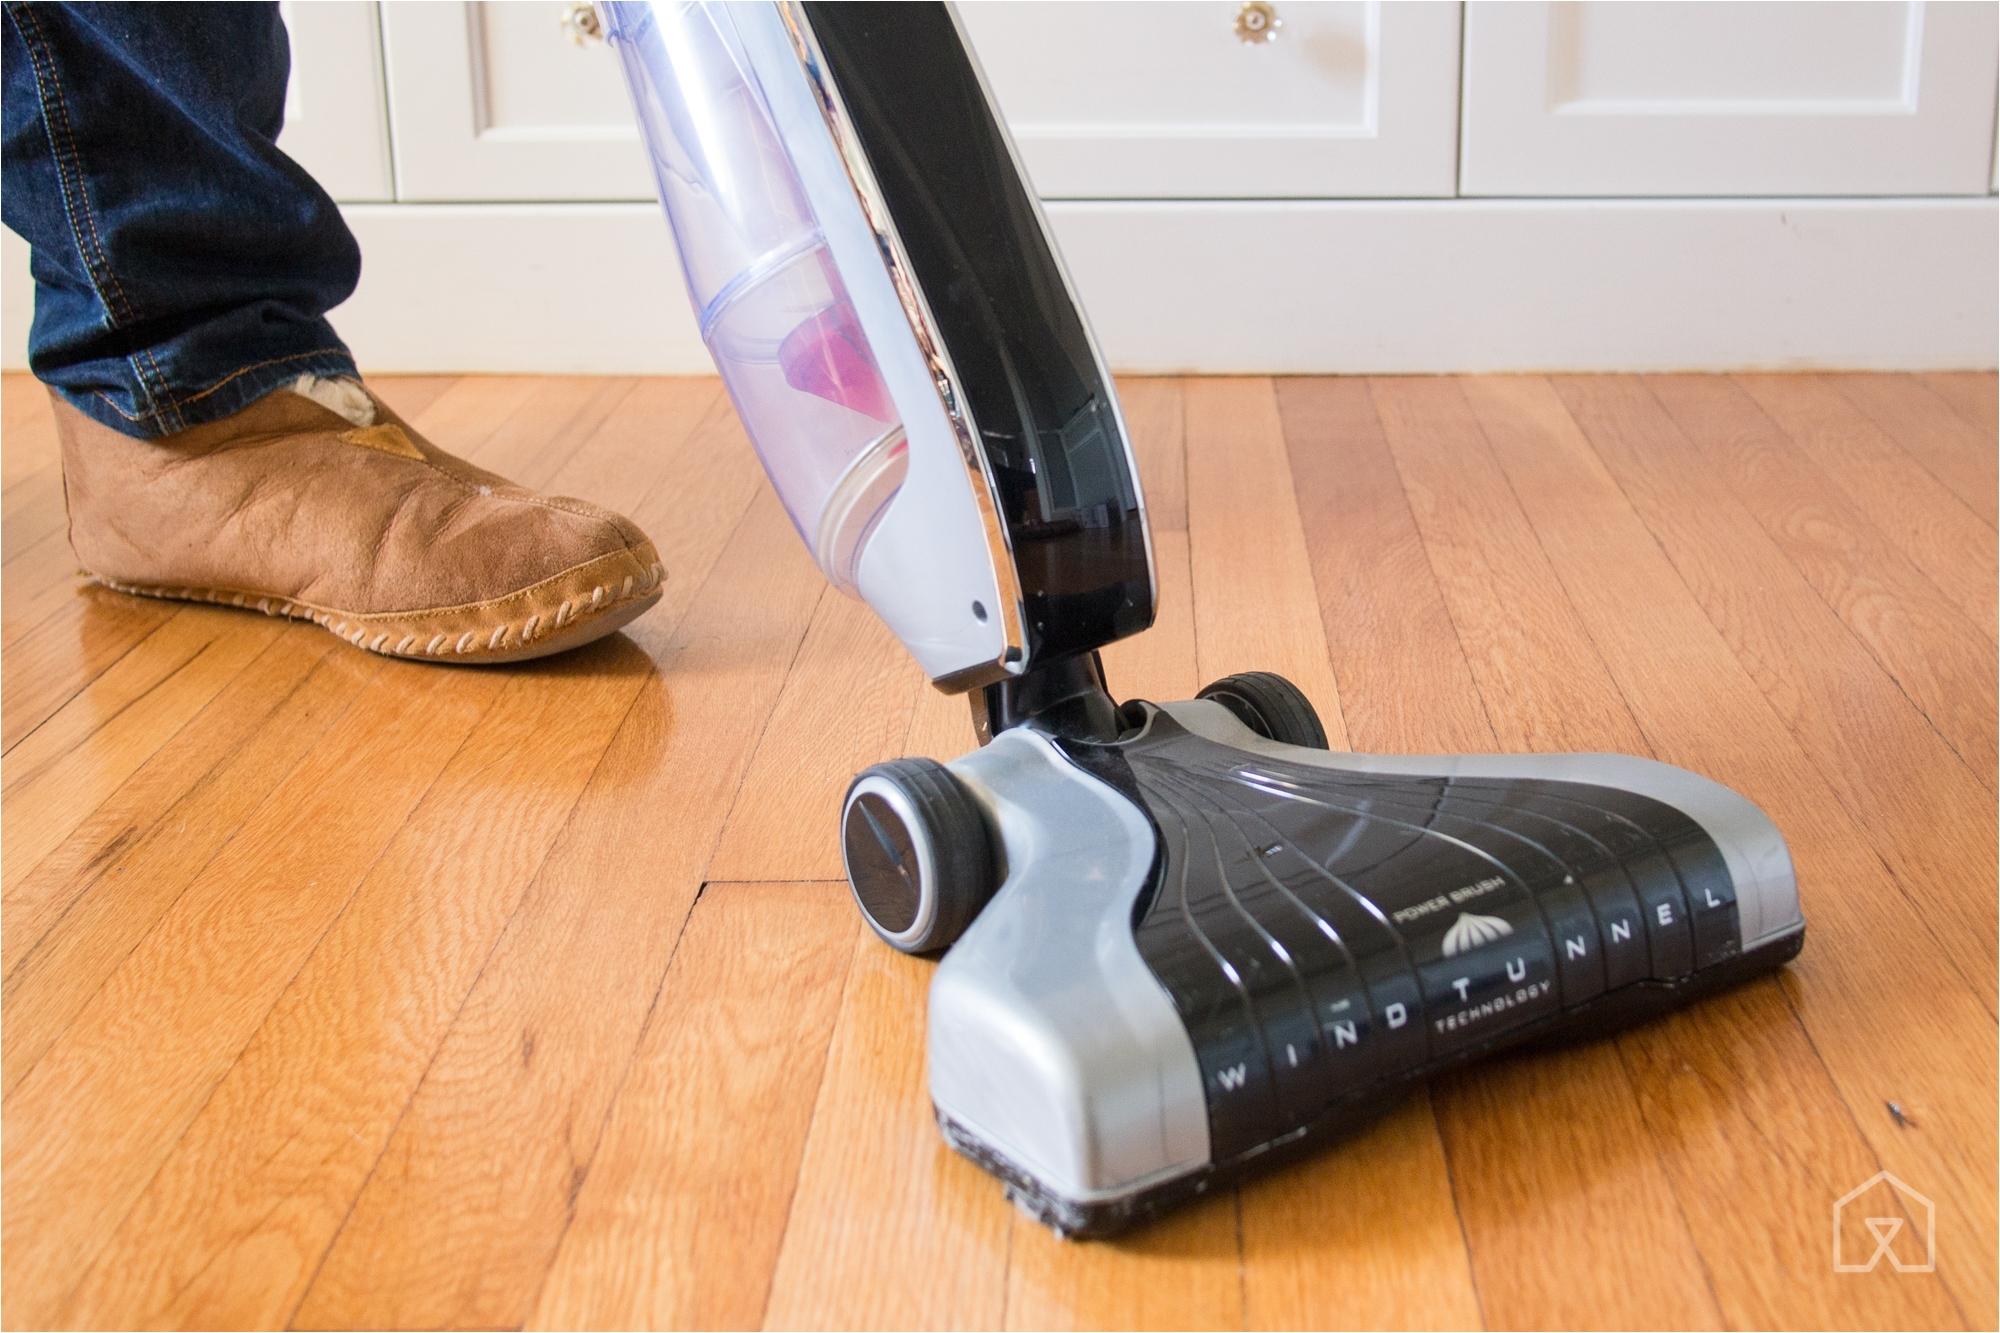 full size of hardwood floor cleaning best cordless vacuum for hardwood floors battery vacuum best